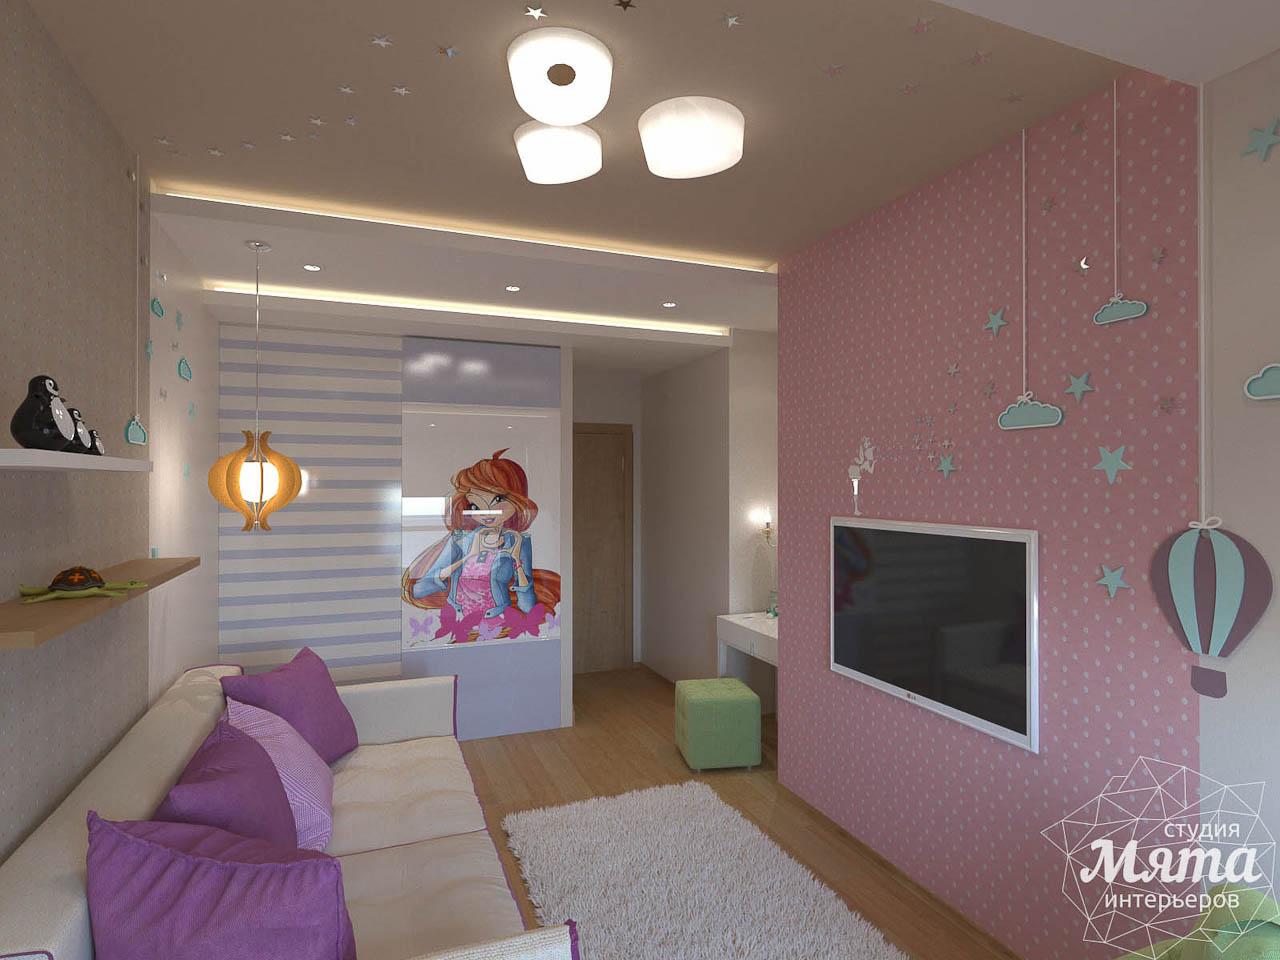 Дизайн интерьера трехкомнатной квартиры по ул. Мельникова 27 img2076930631